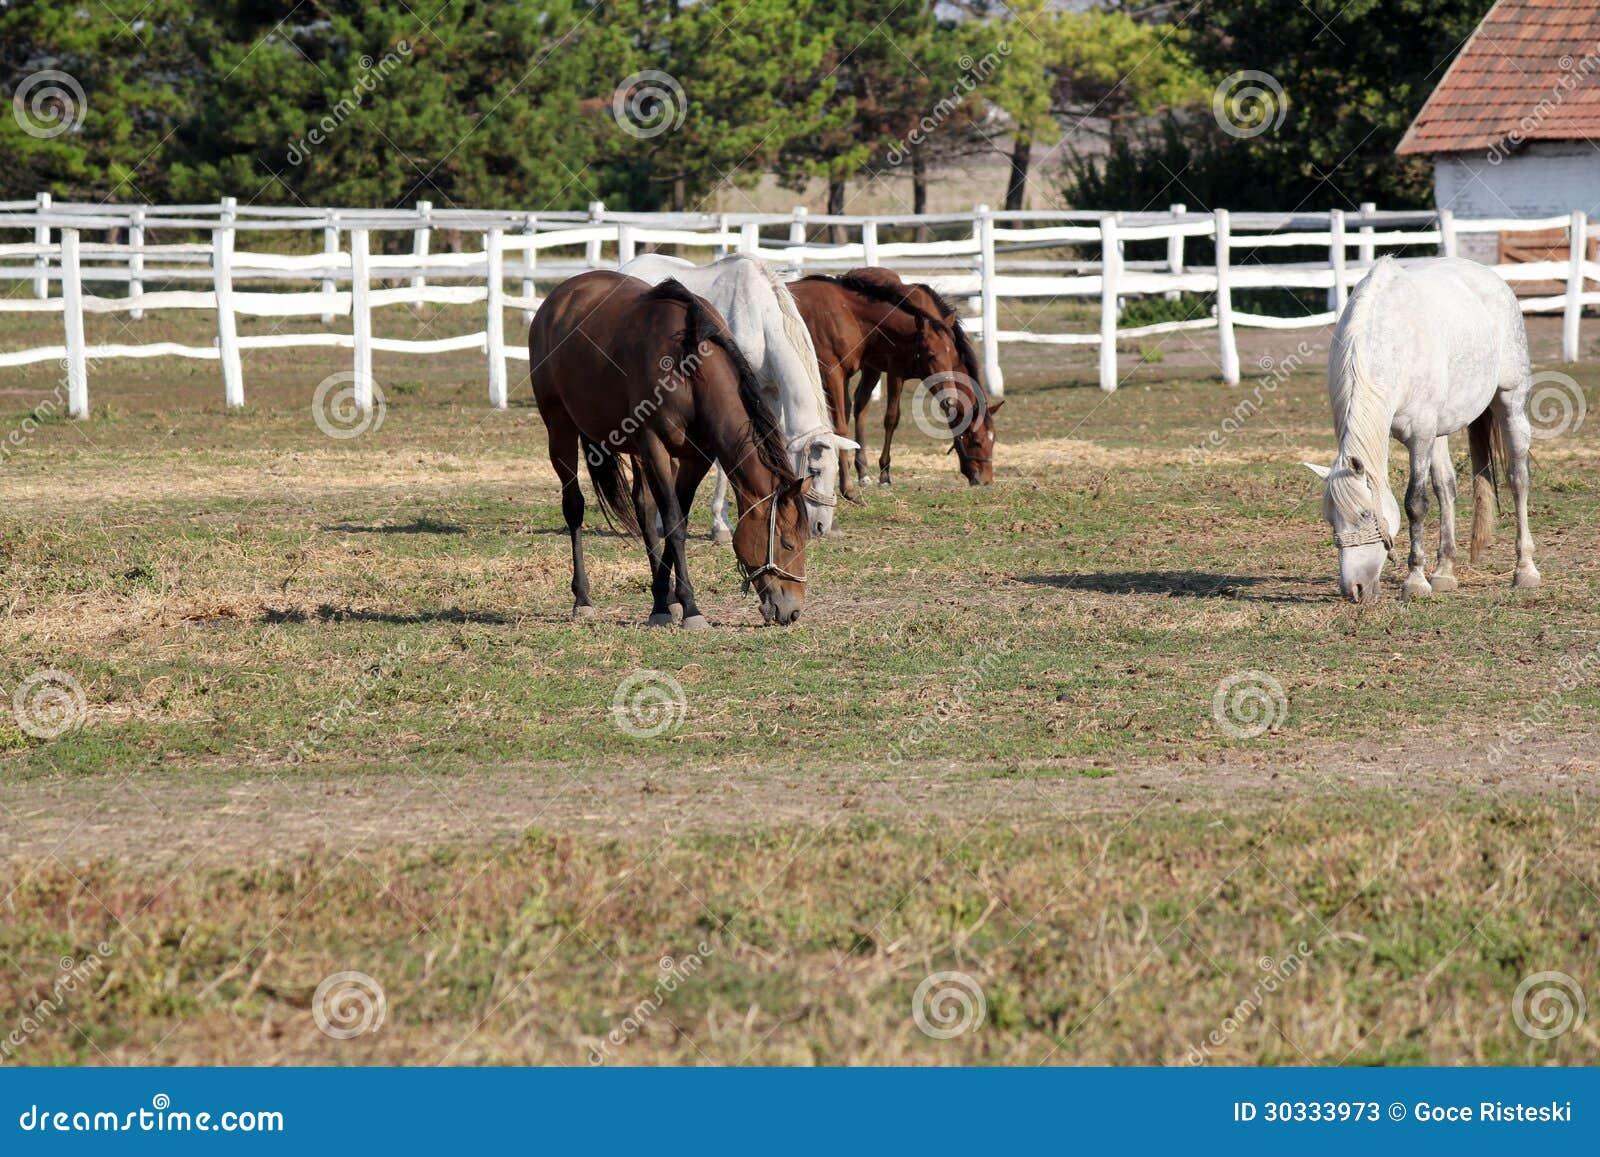 Manada de caballos en corral